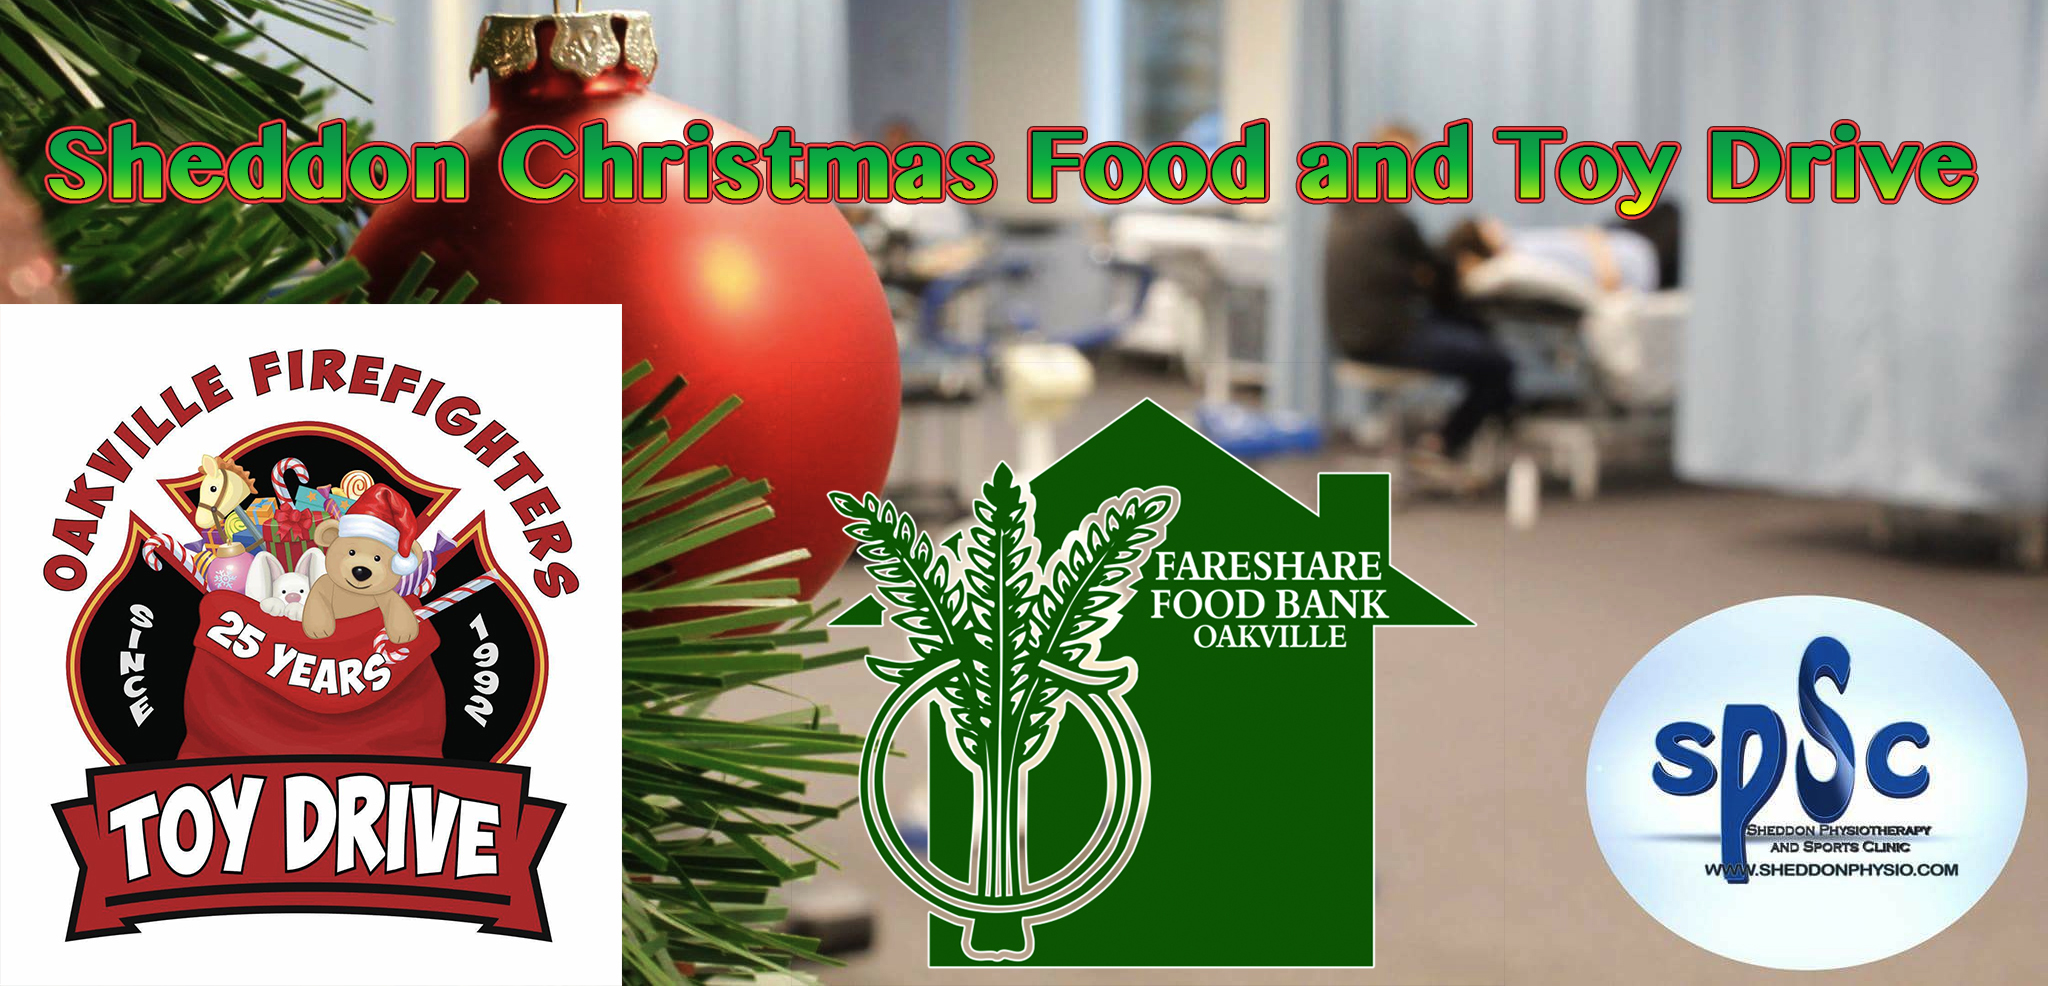 Sheddon Christmas Food and Toy Drive